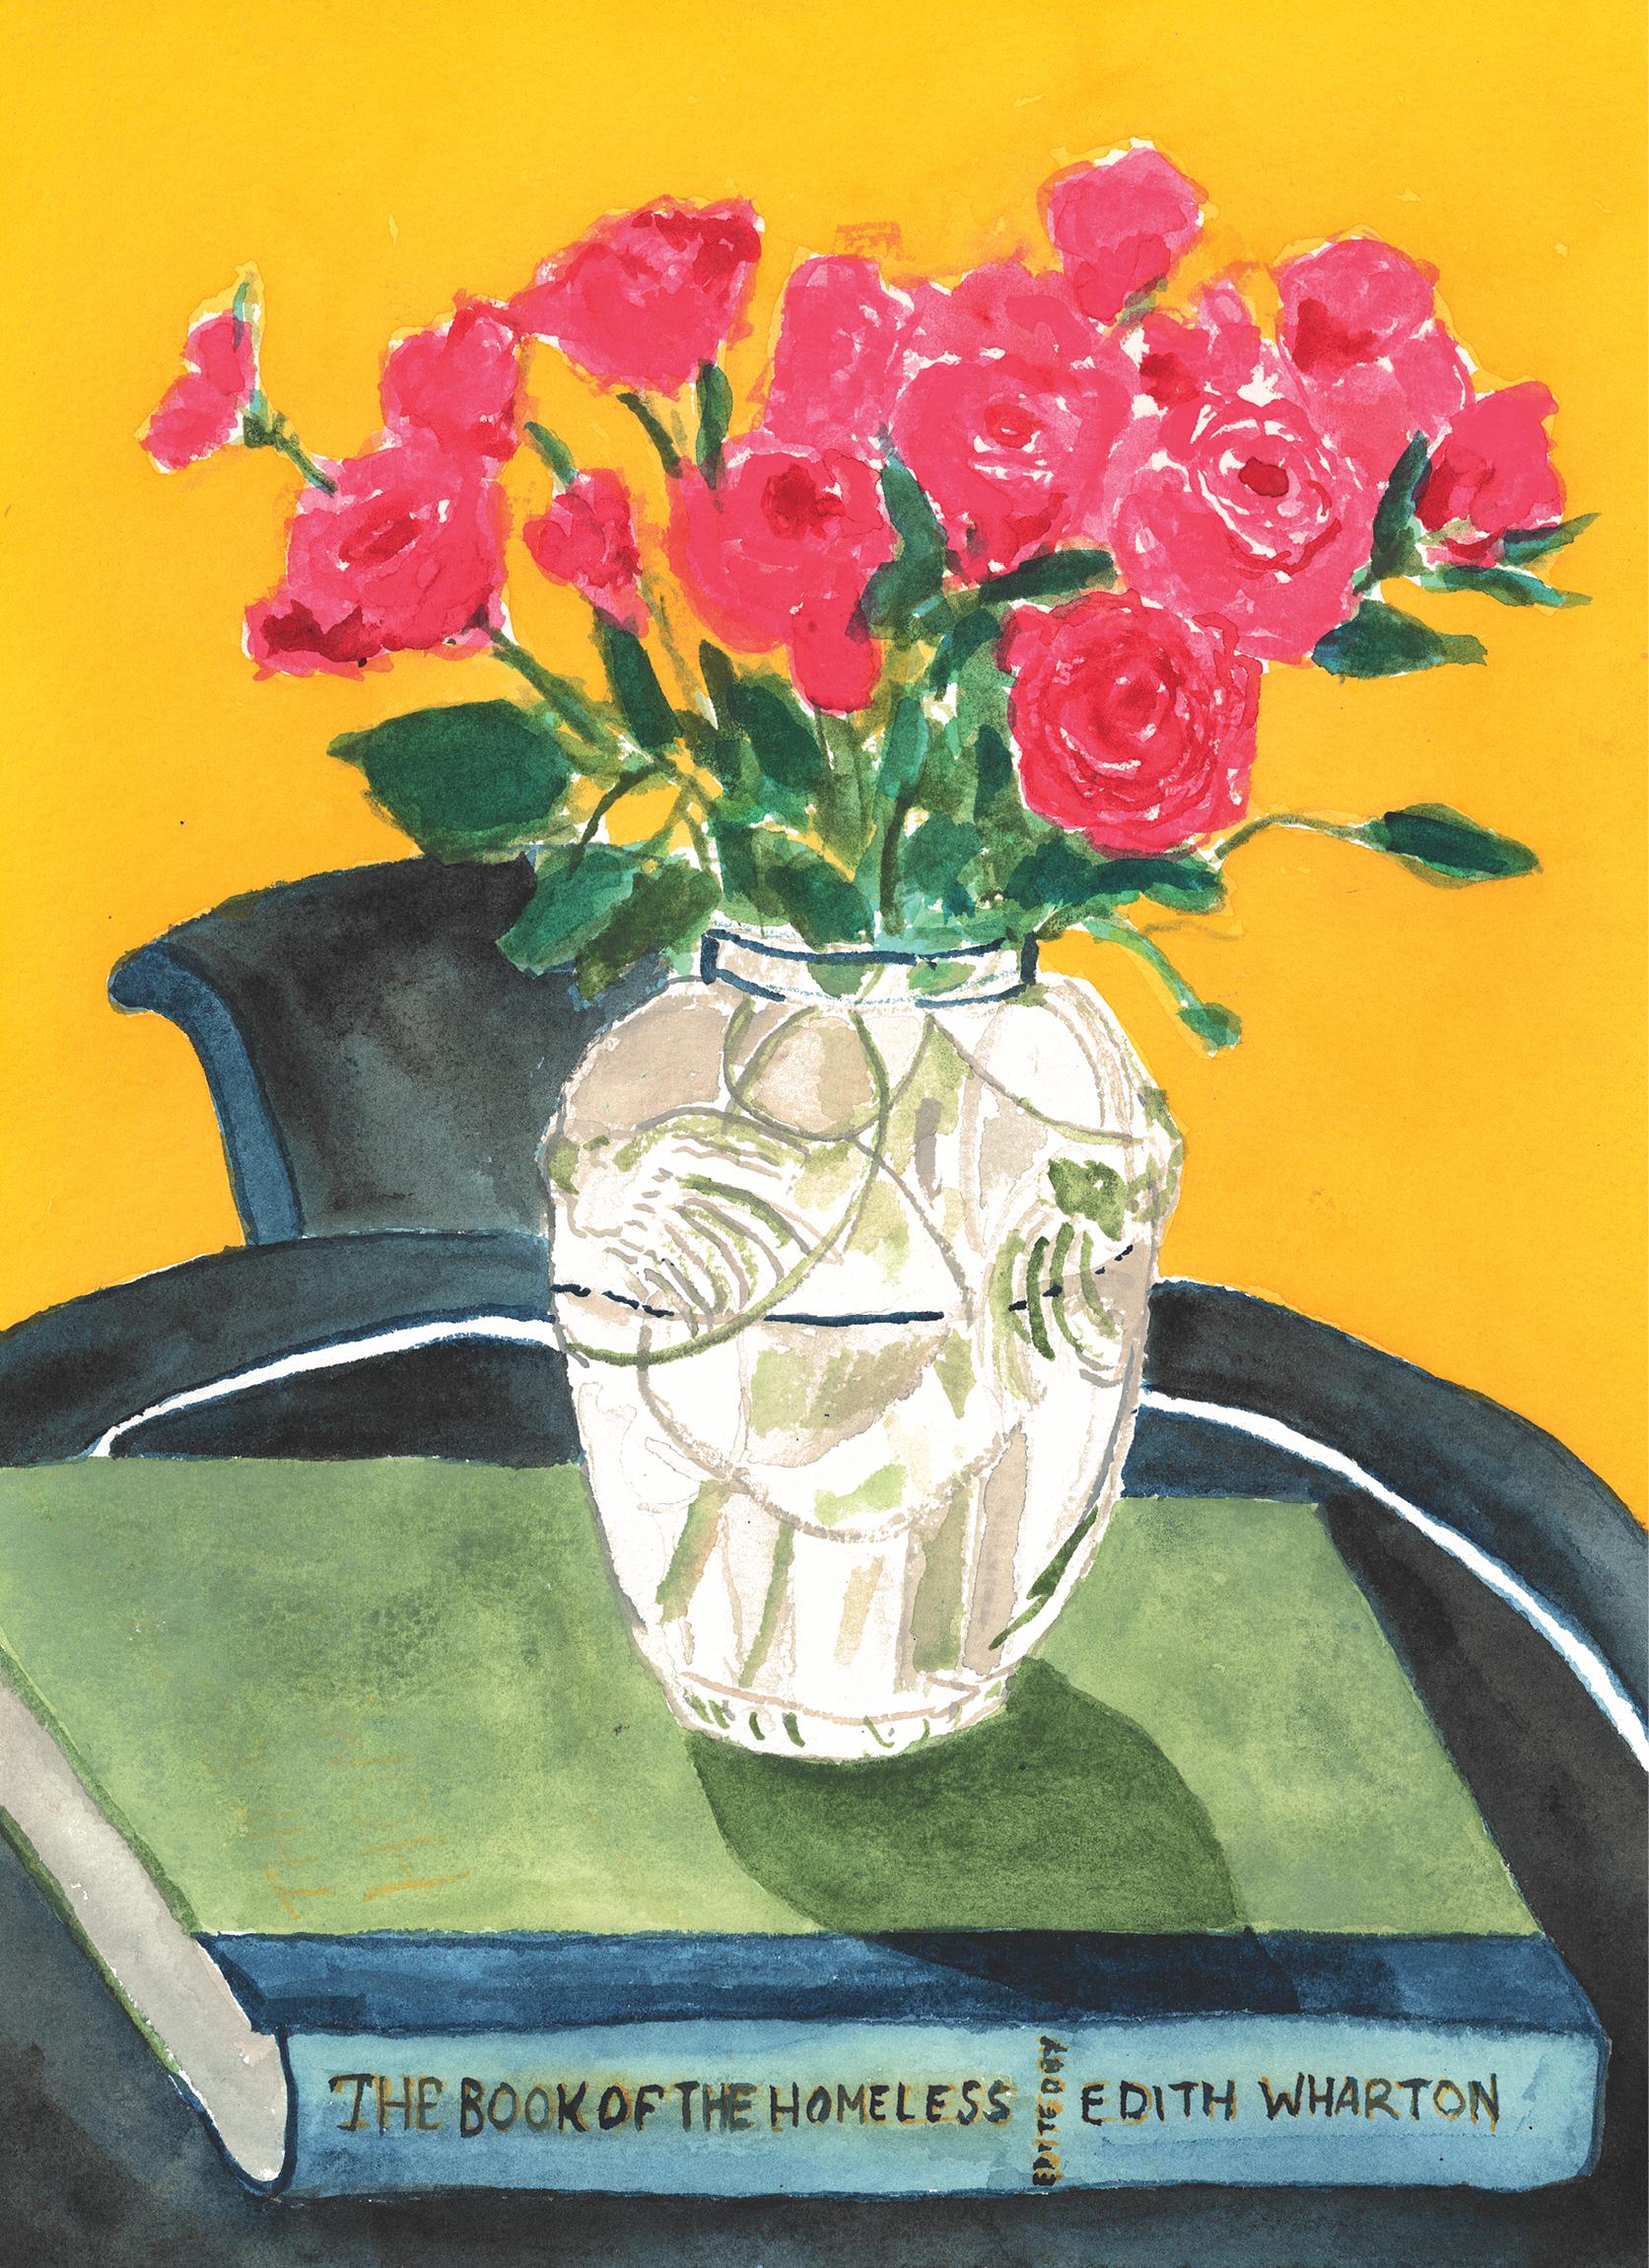 Deco Vase of Roses (Edith Wharton), 2020. Gouache on Arches Paper